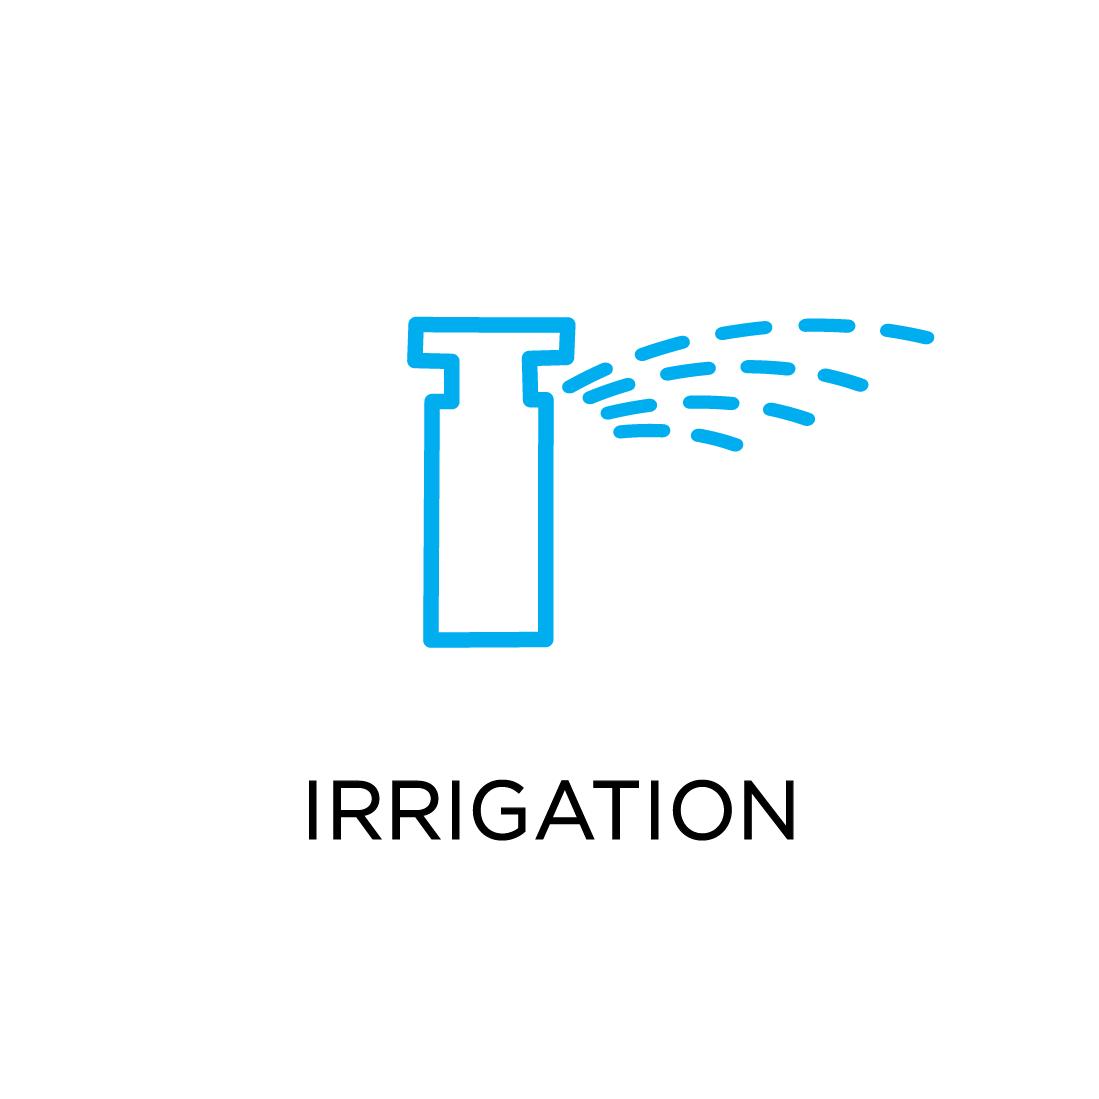 SLE_irrigation.png